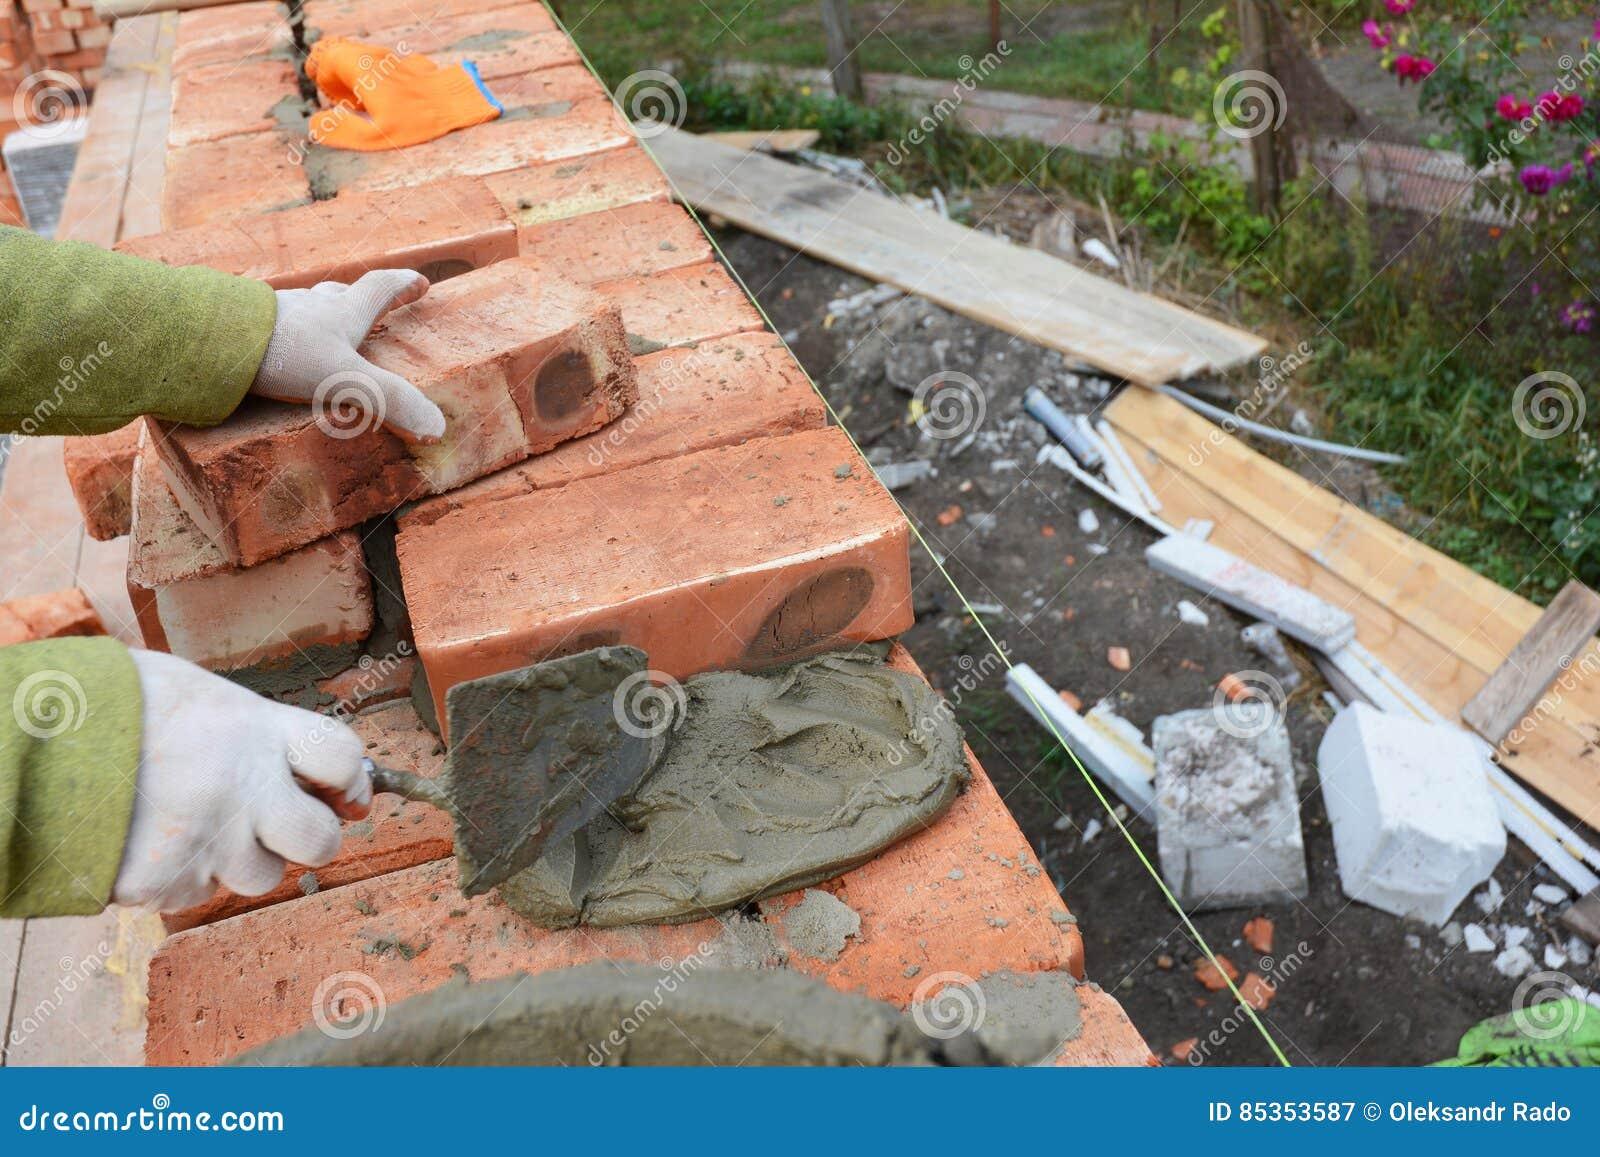 Bricklaying Bricklayer Worker Installing Red Blocks And Caulking Brick Masonry Joints Exterior